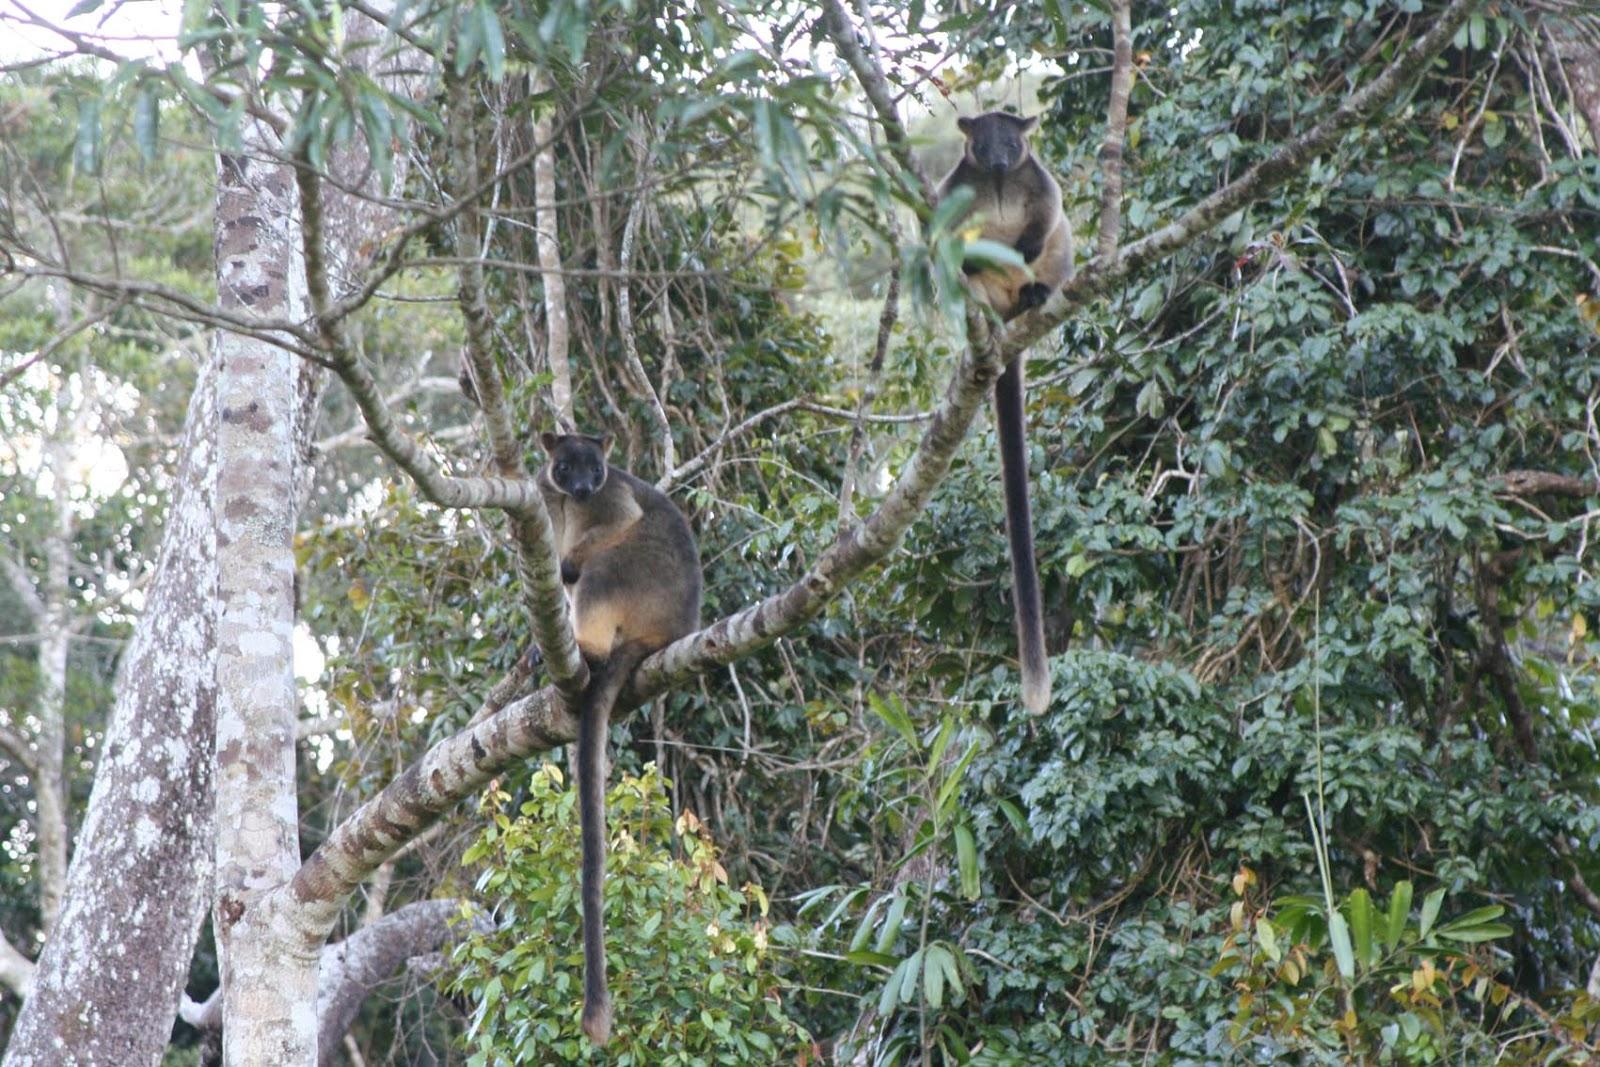 Cute Koala Hd Wallpaper Wildlife Tree Kangaroo Animal Facts And Photos